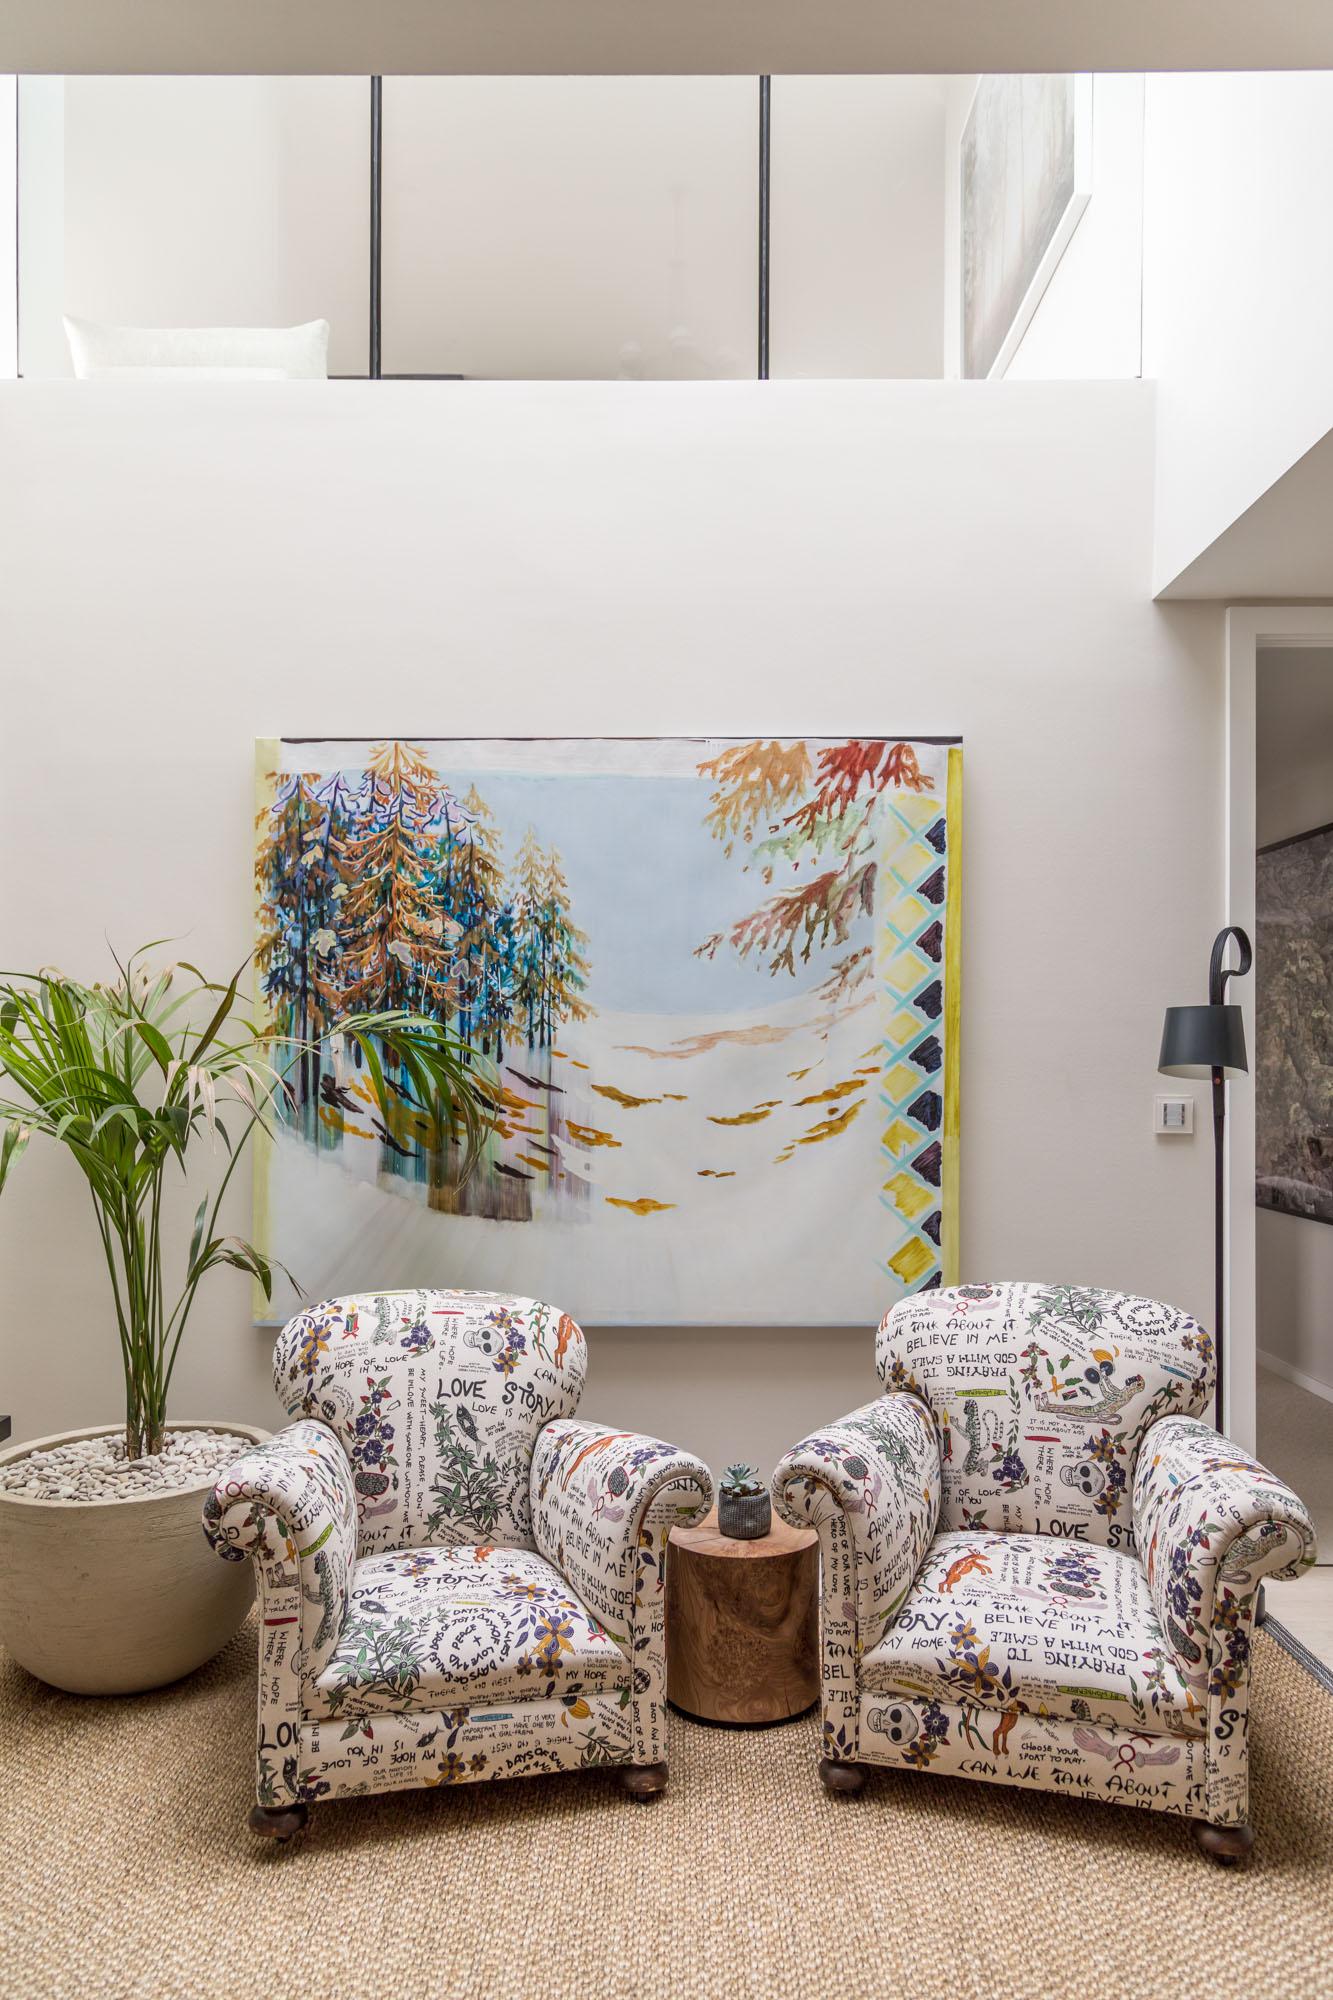 jonathan bond, interior photographer, 2 armchairs in living room, battersea, london